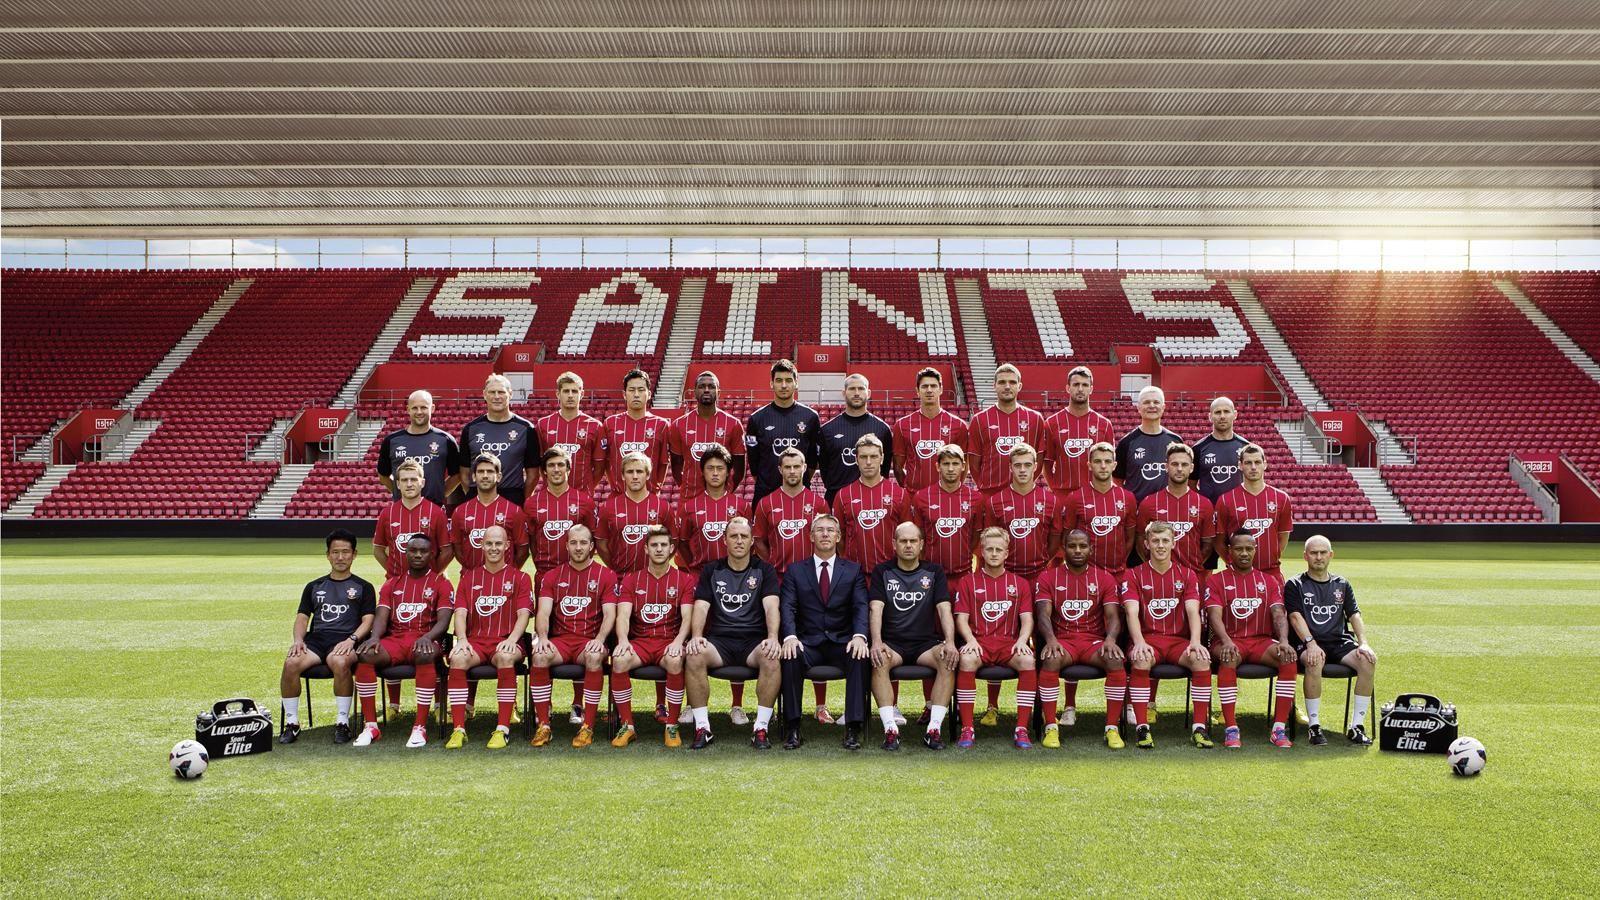 Southampton FC Squad Wallpaper 2013-2014